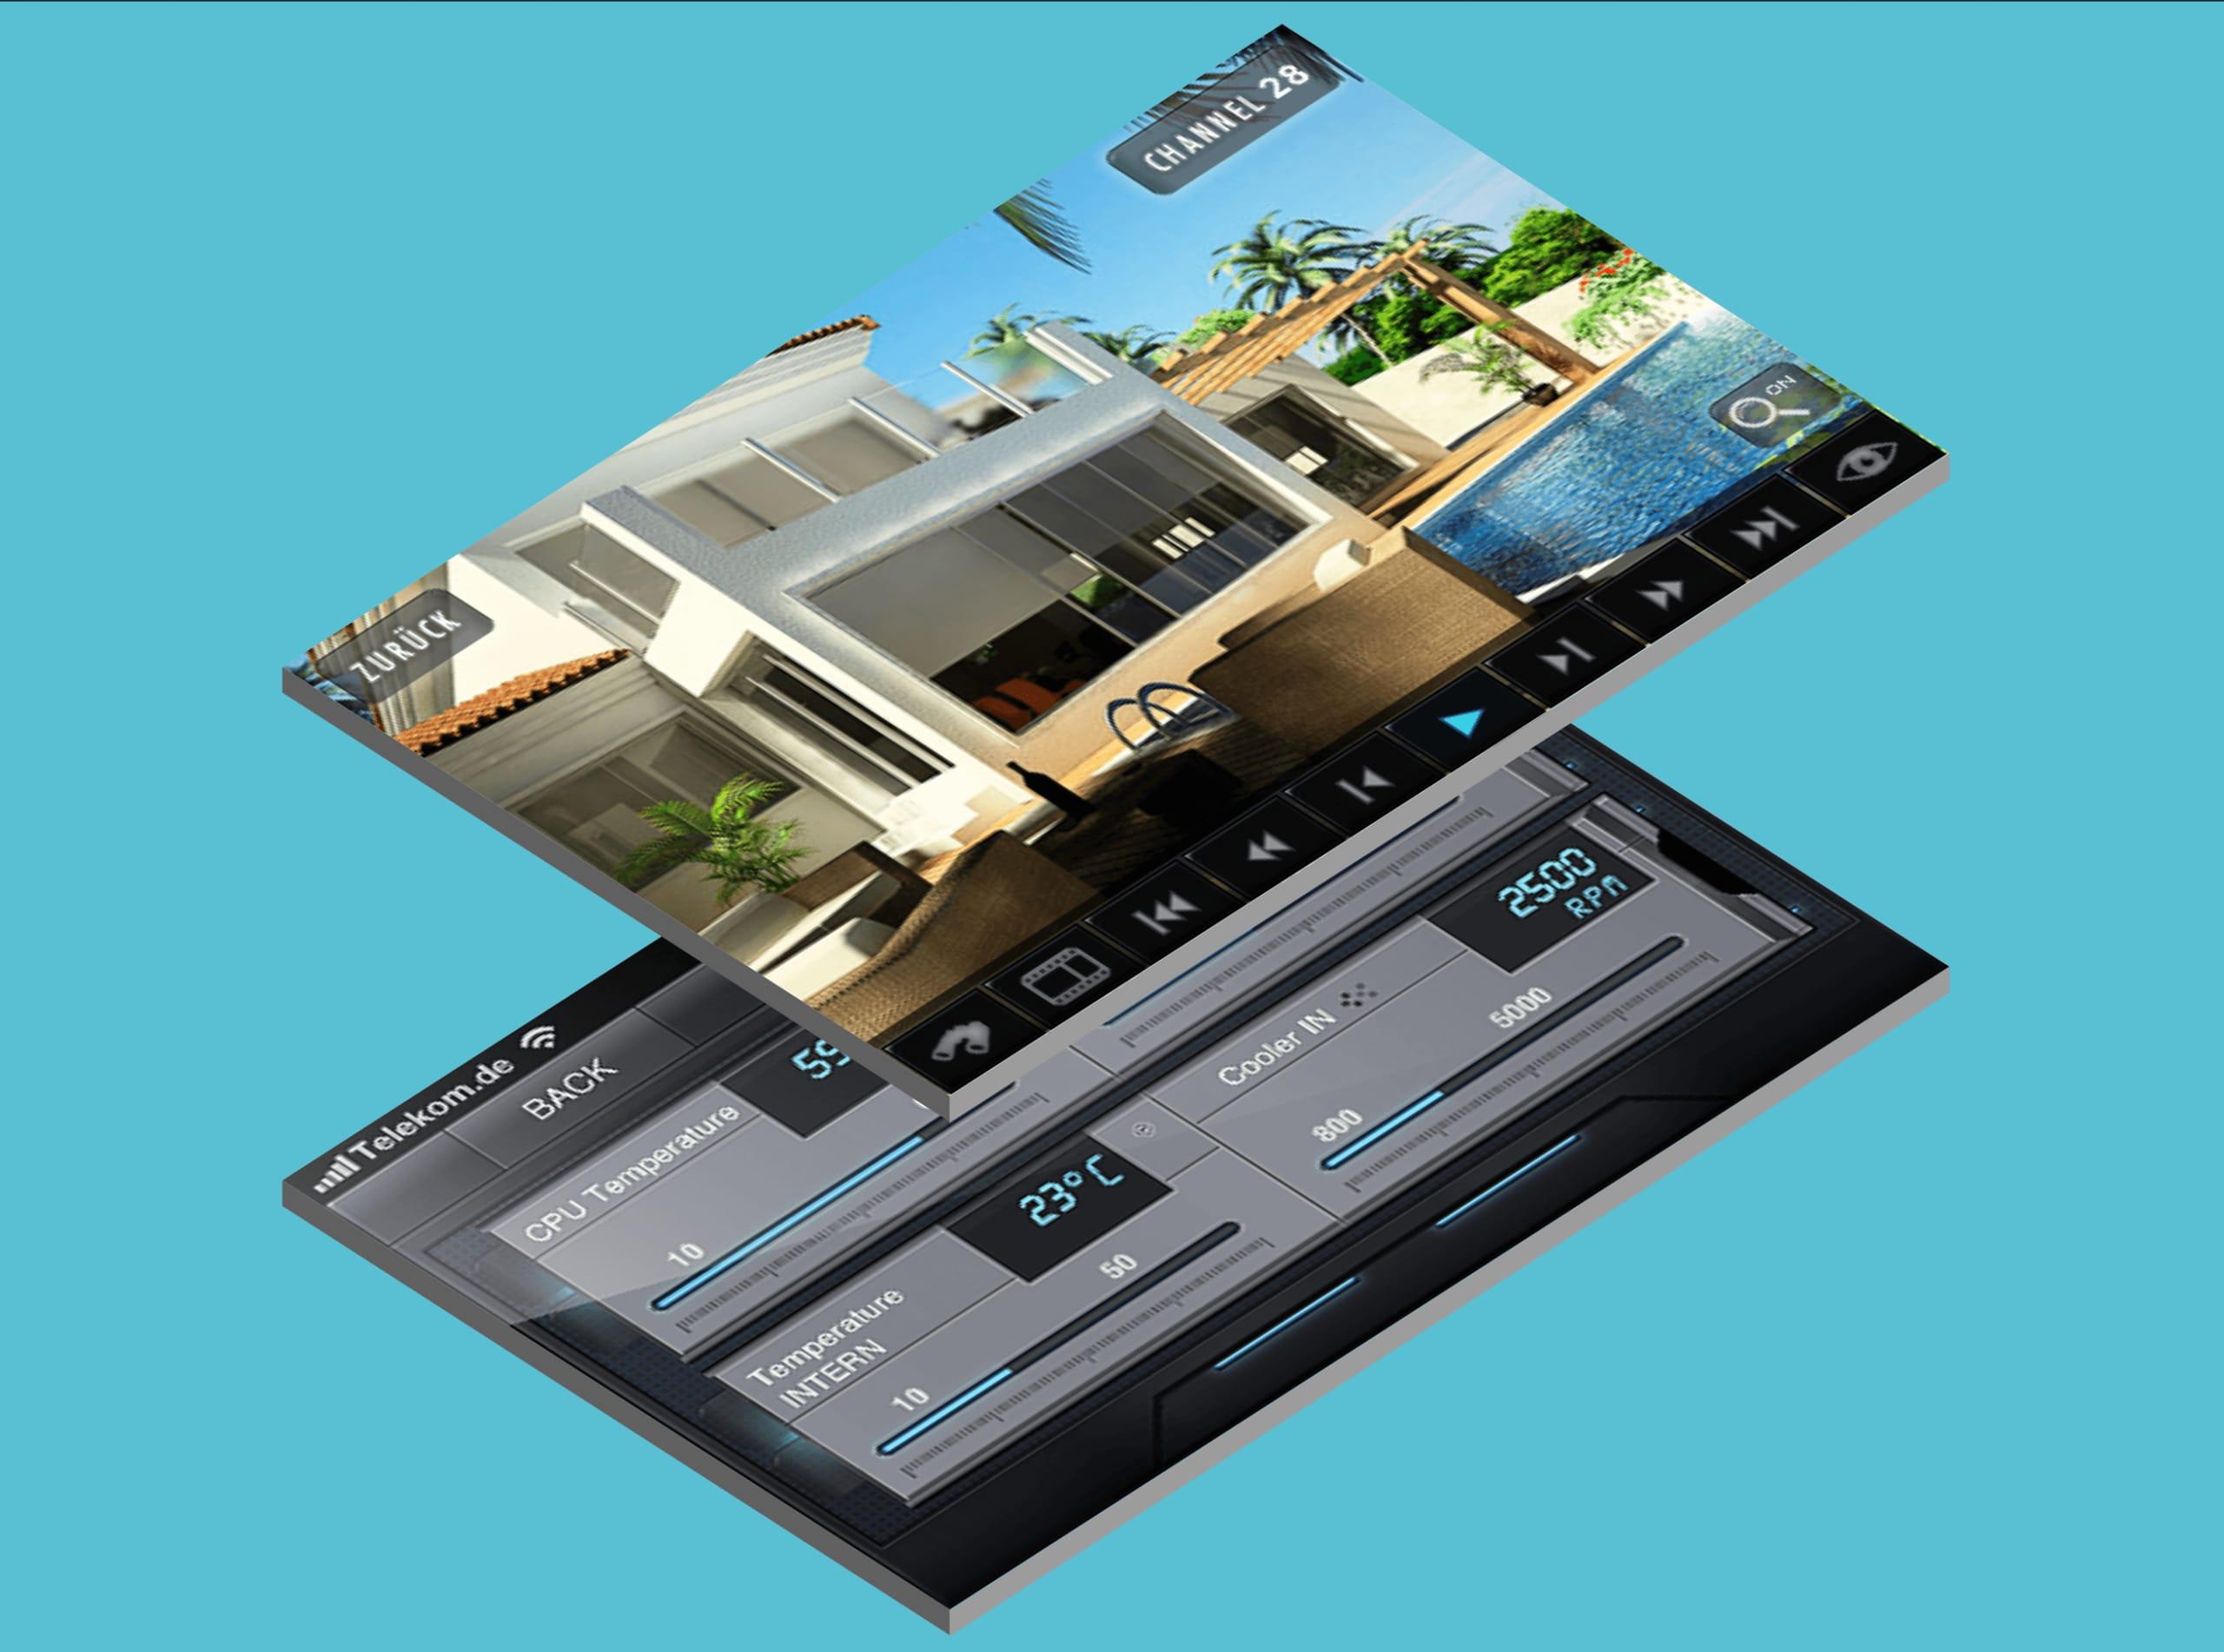 Dallmeier-iPhone-App-010B@3x-mobile